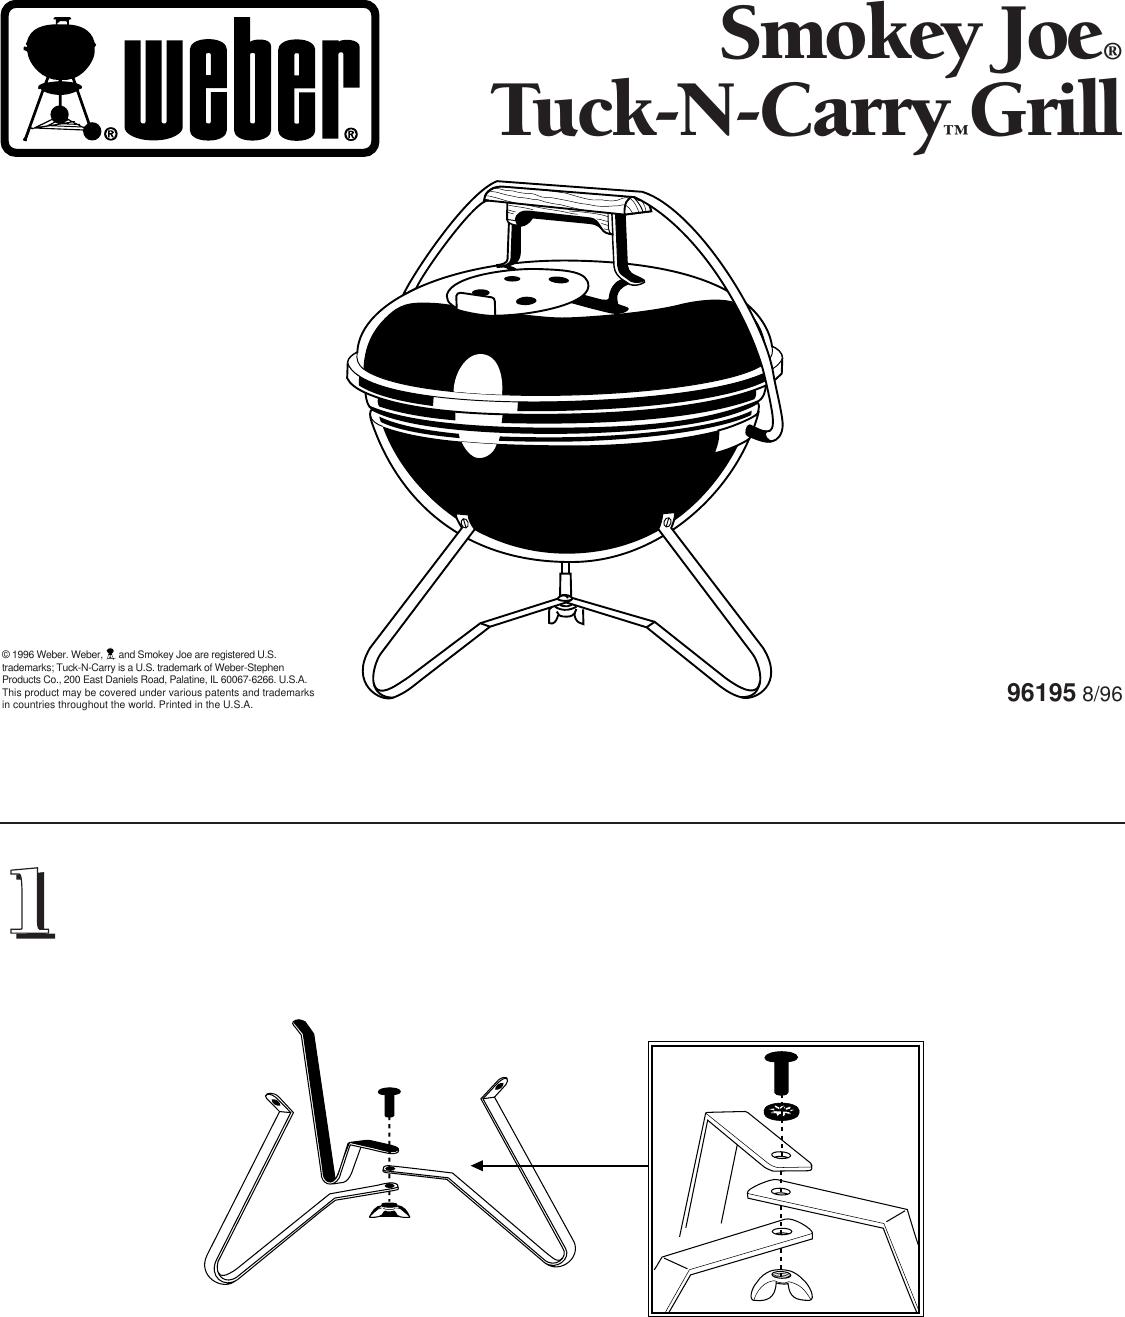 Weber Smokey Joe Grill Gold Installation Manual Tuck N